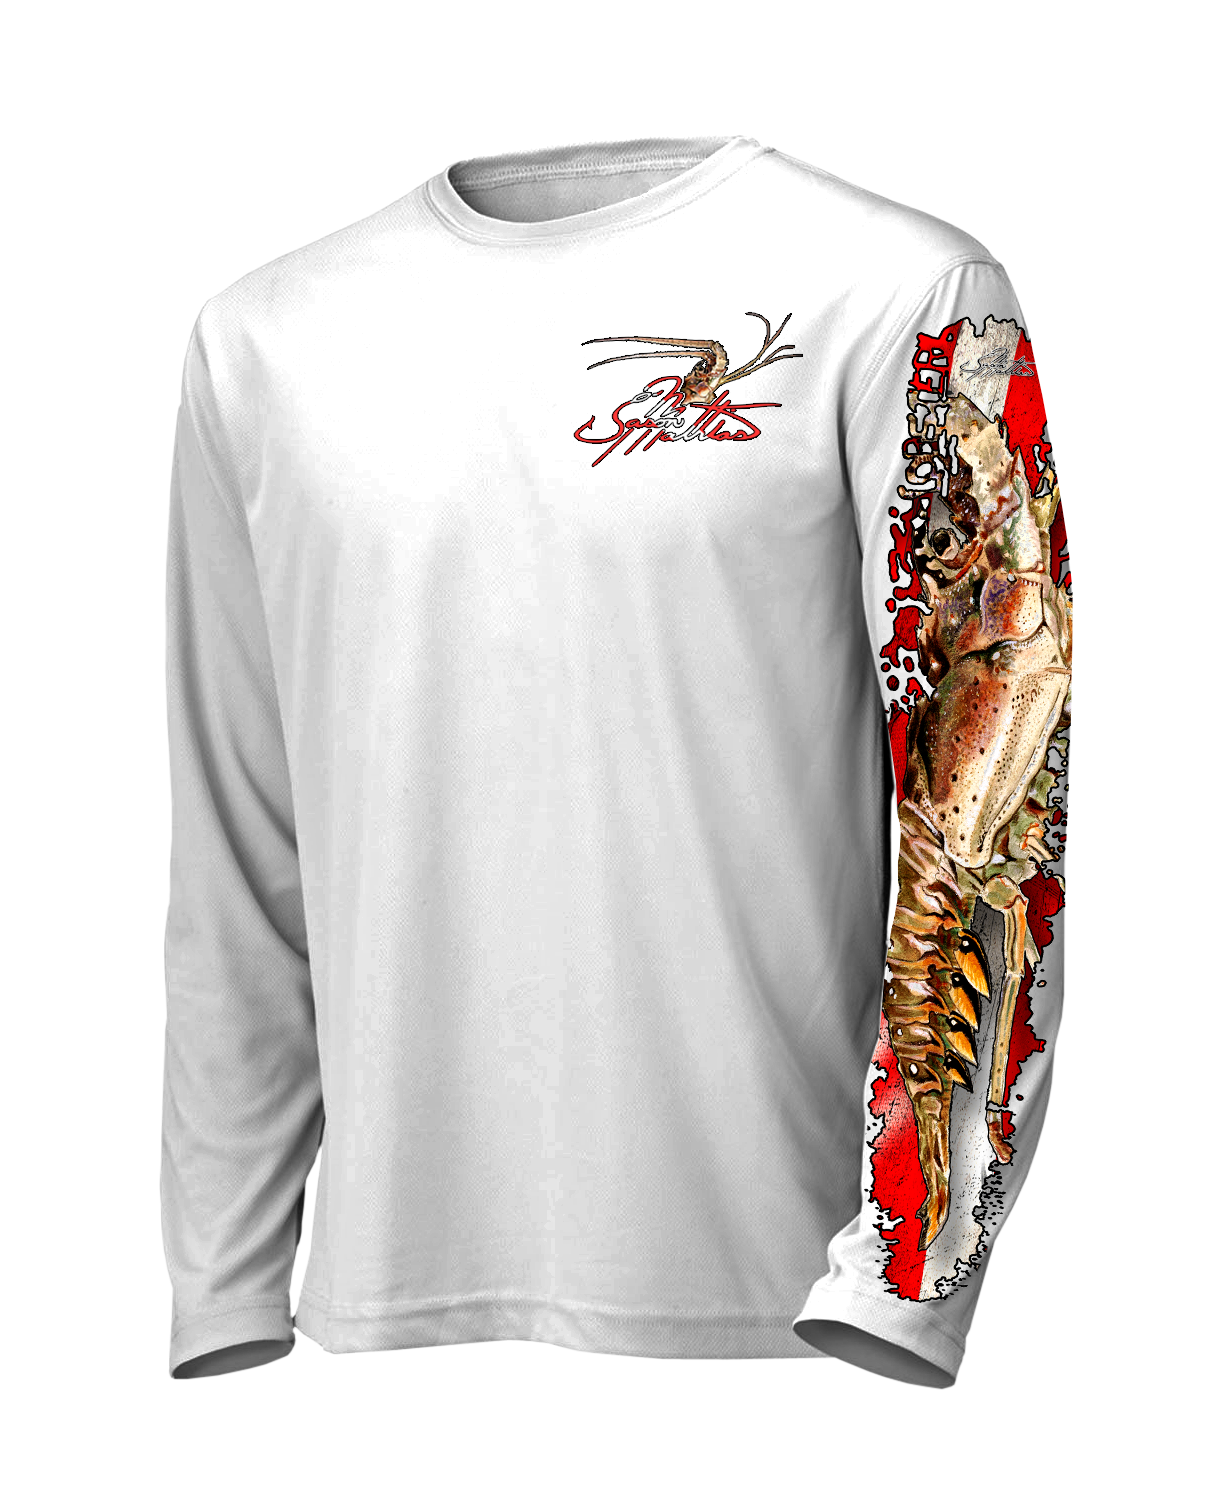 jason-mathias-shirt-line-white-front-lobster-shirt.png